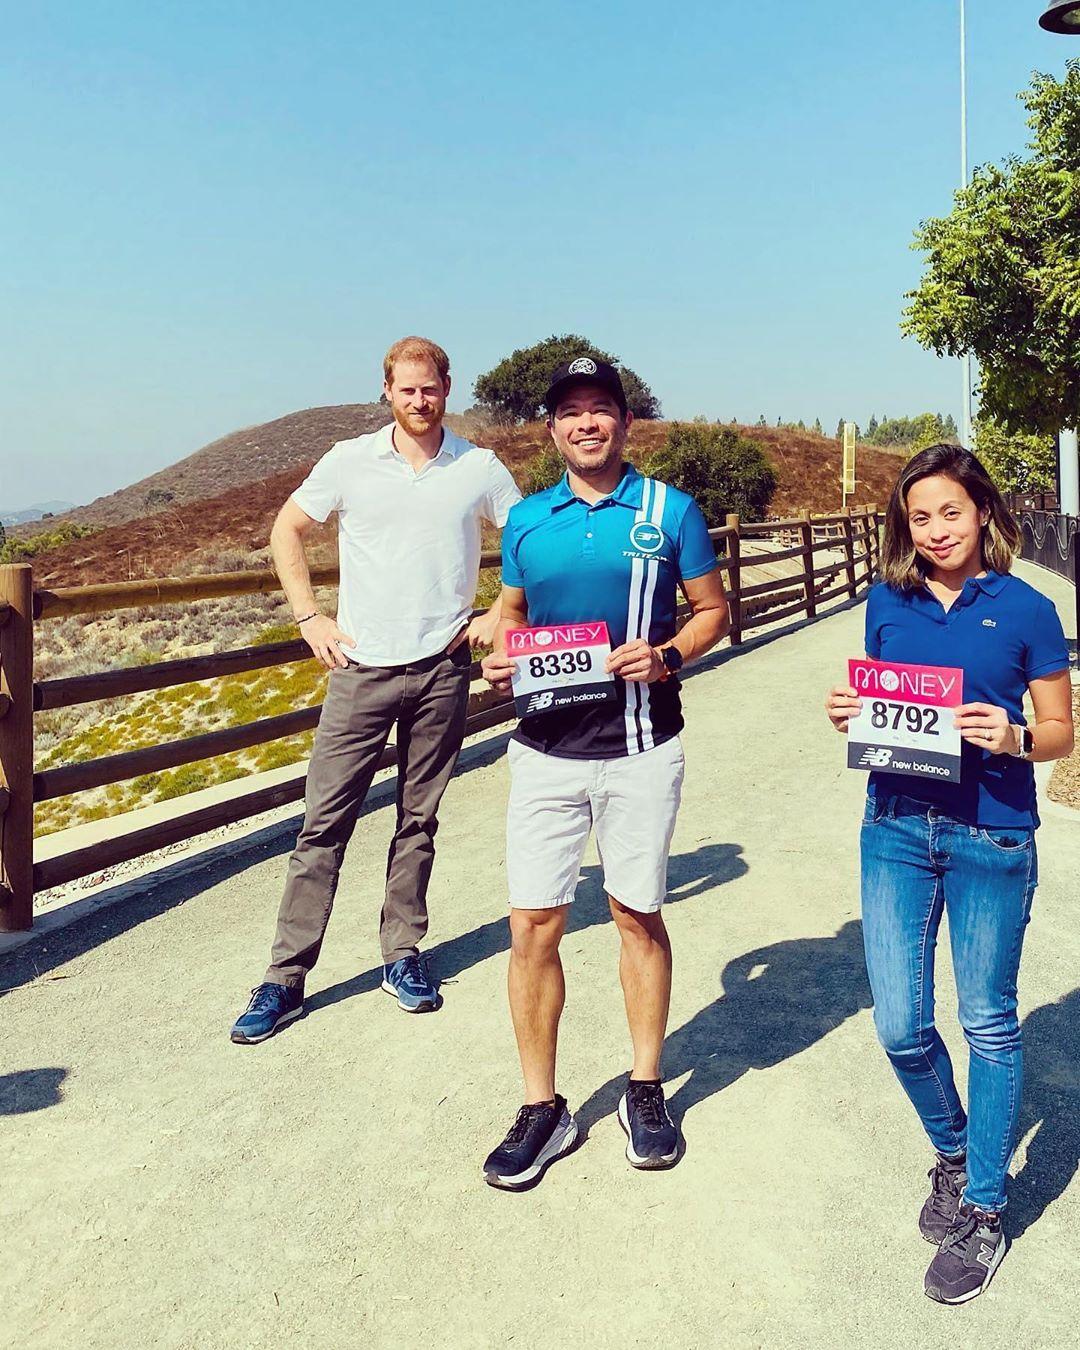 LA在住のヘンリー王子、ロンドンマラソンのランナーを驚かす!(ハーパーズ バザー・オンライン) - Yahoo!ニュース